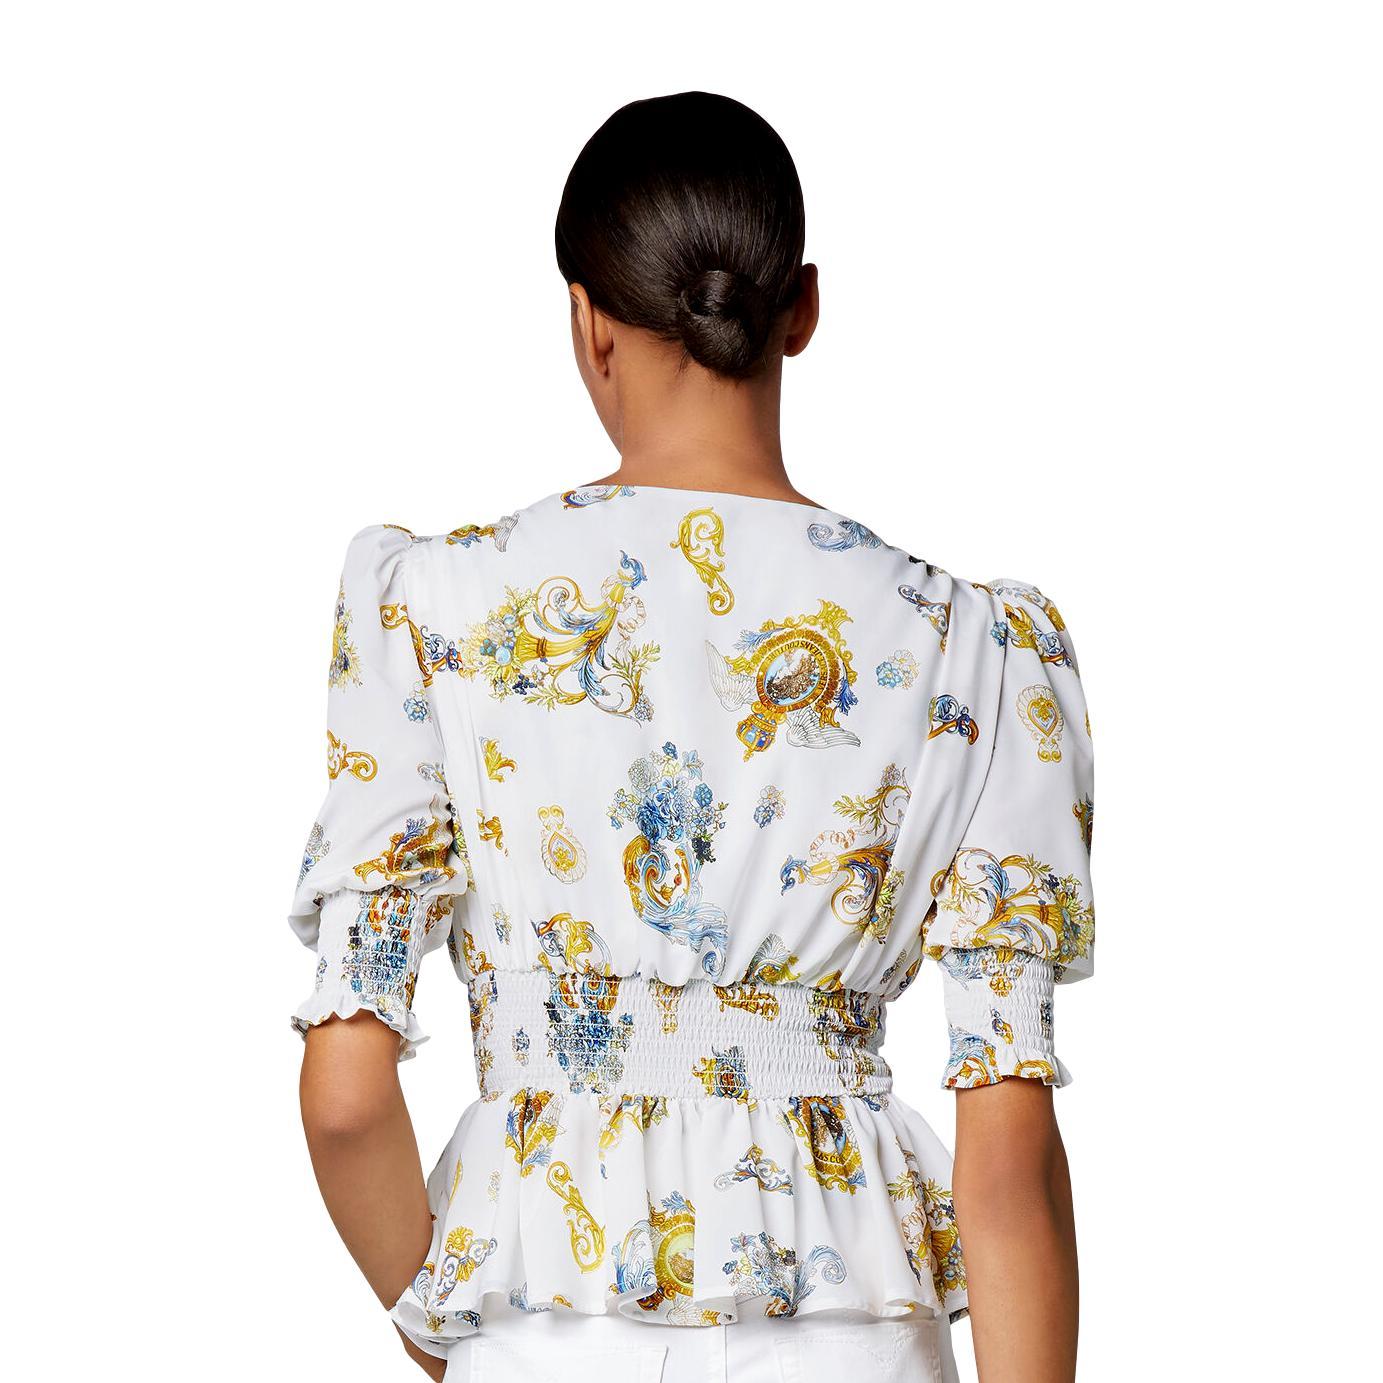 top stampa barocca rococo VERSACE JEANS COUTURE | Camicia | B0HWA626 S0996003